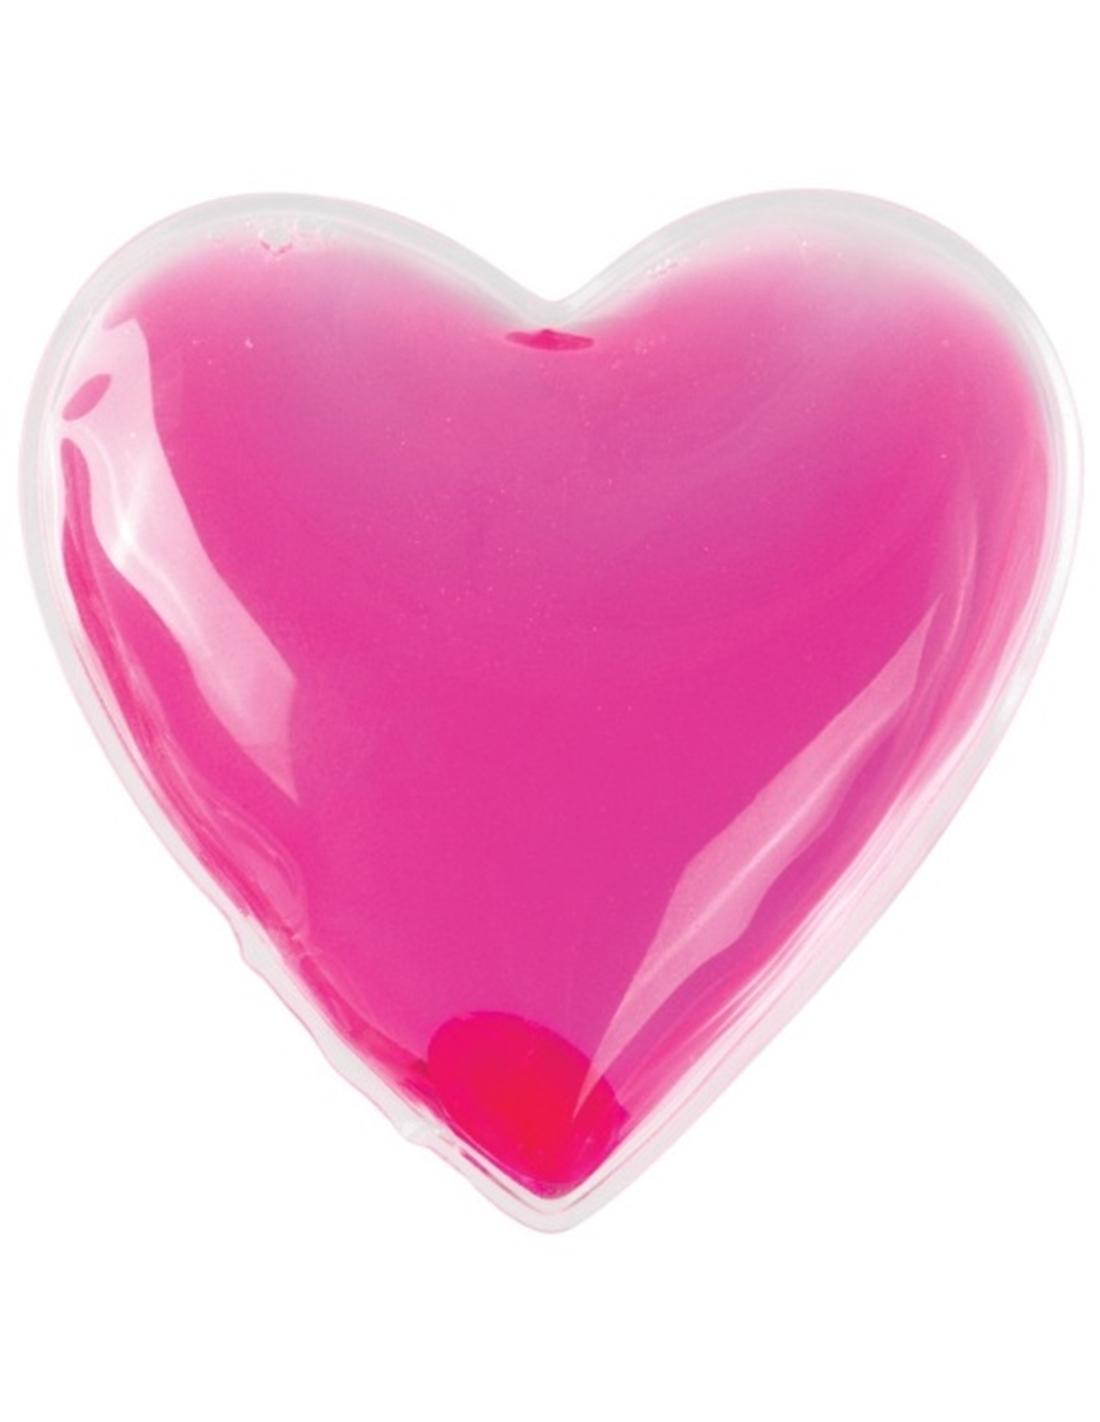 Massajador Hot Heart Massager Médio Rosa - PR2010301178